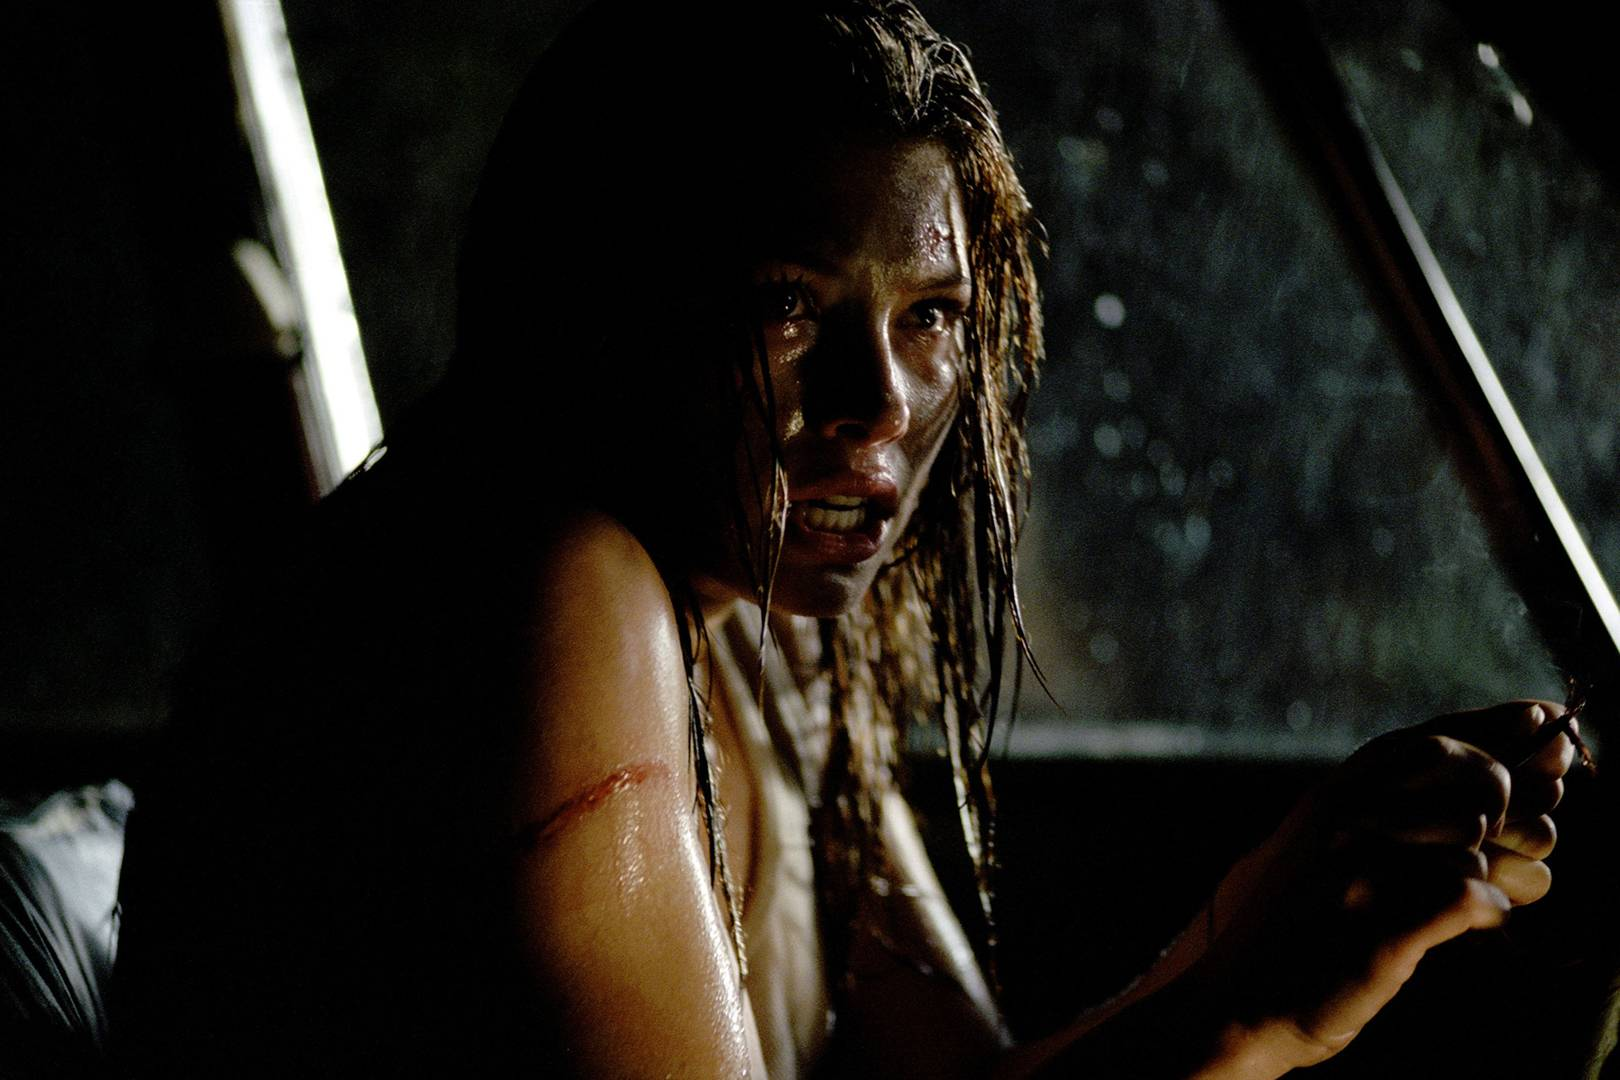 best horror films on netflix uk 2018 british gq